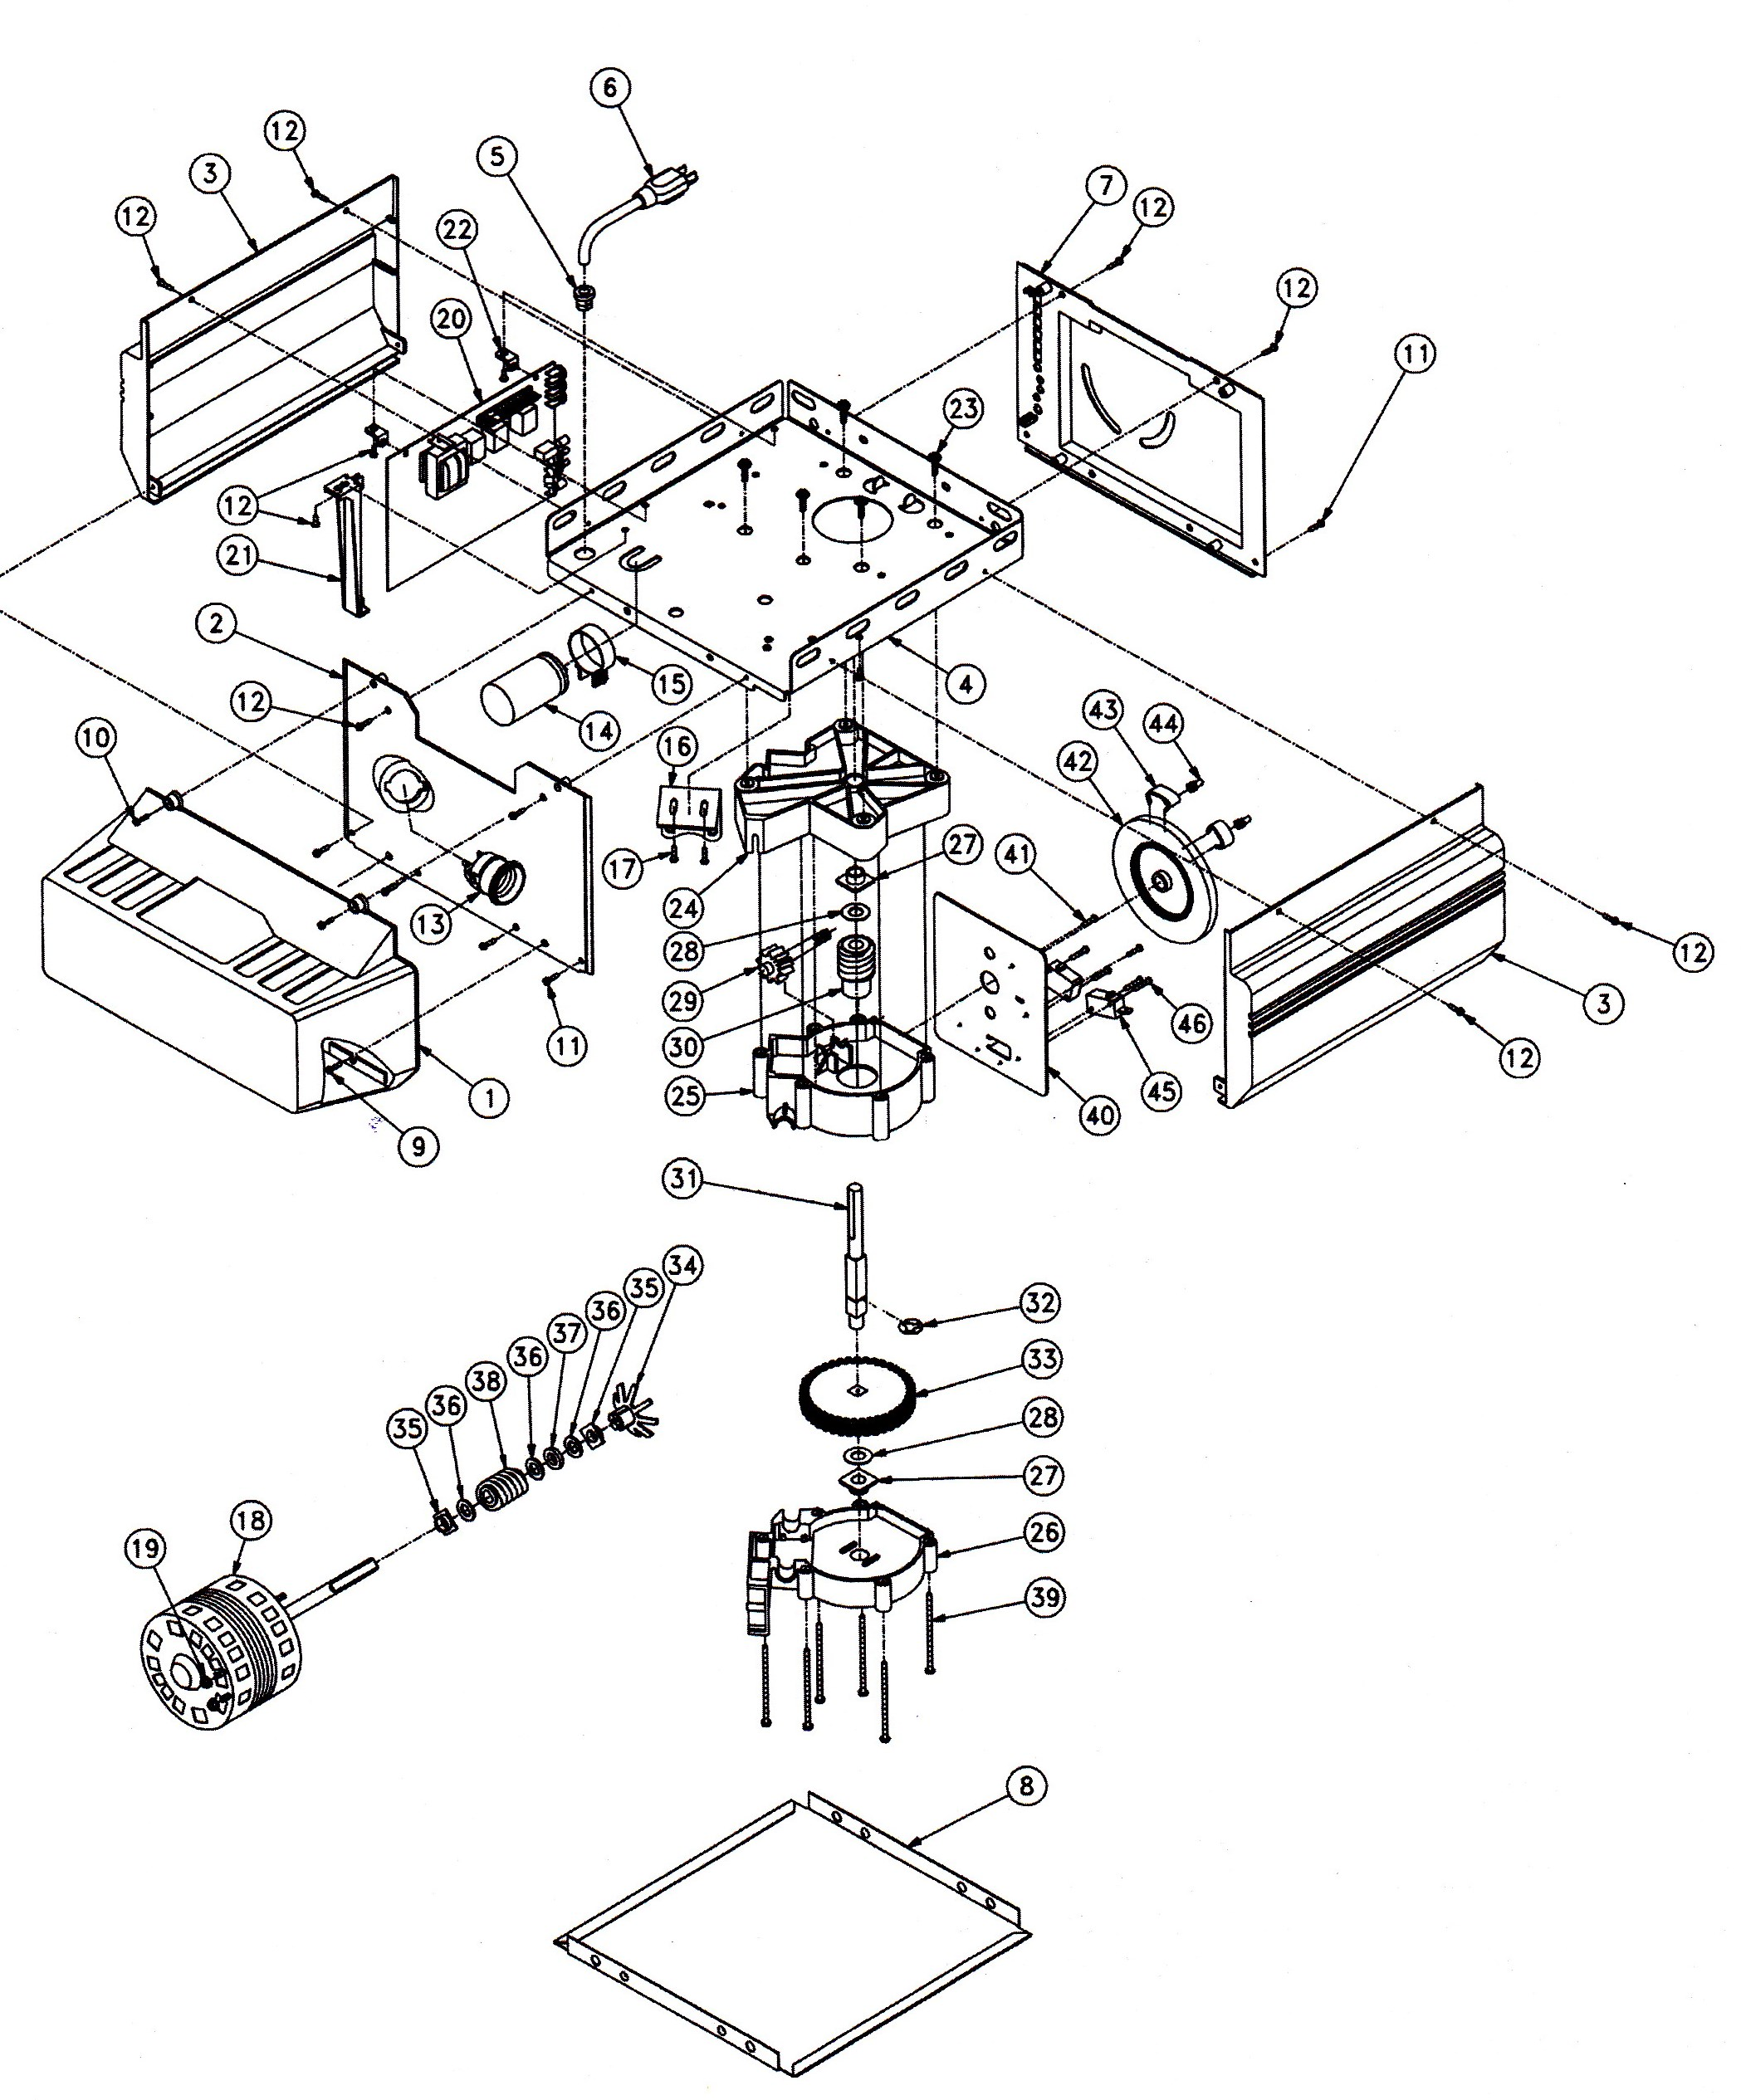 legacy 496 696cropped?t=1455888506 diagrams 400325 rsx garage door sensor wiring diagram genie overhead door wiring diagrams at gsmportal.co